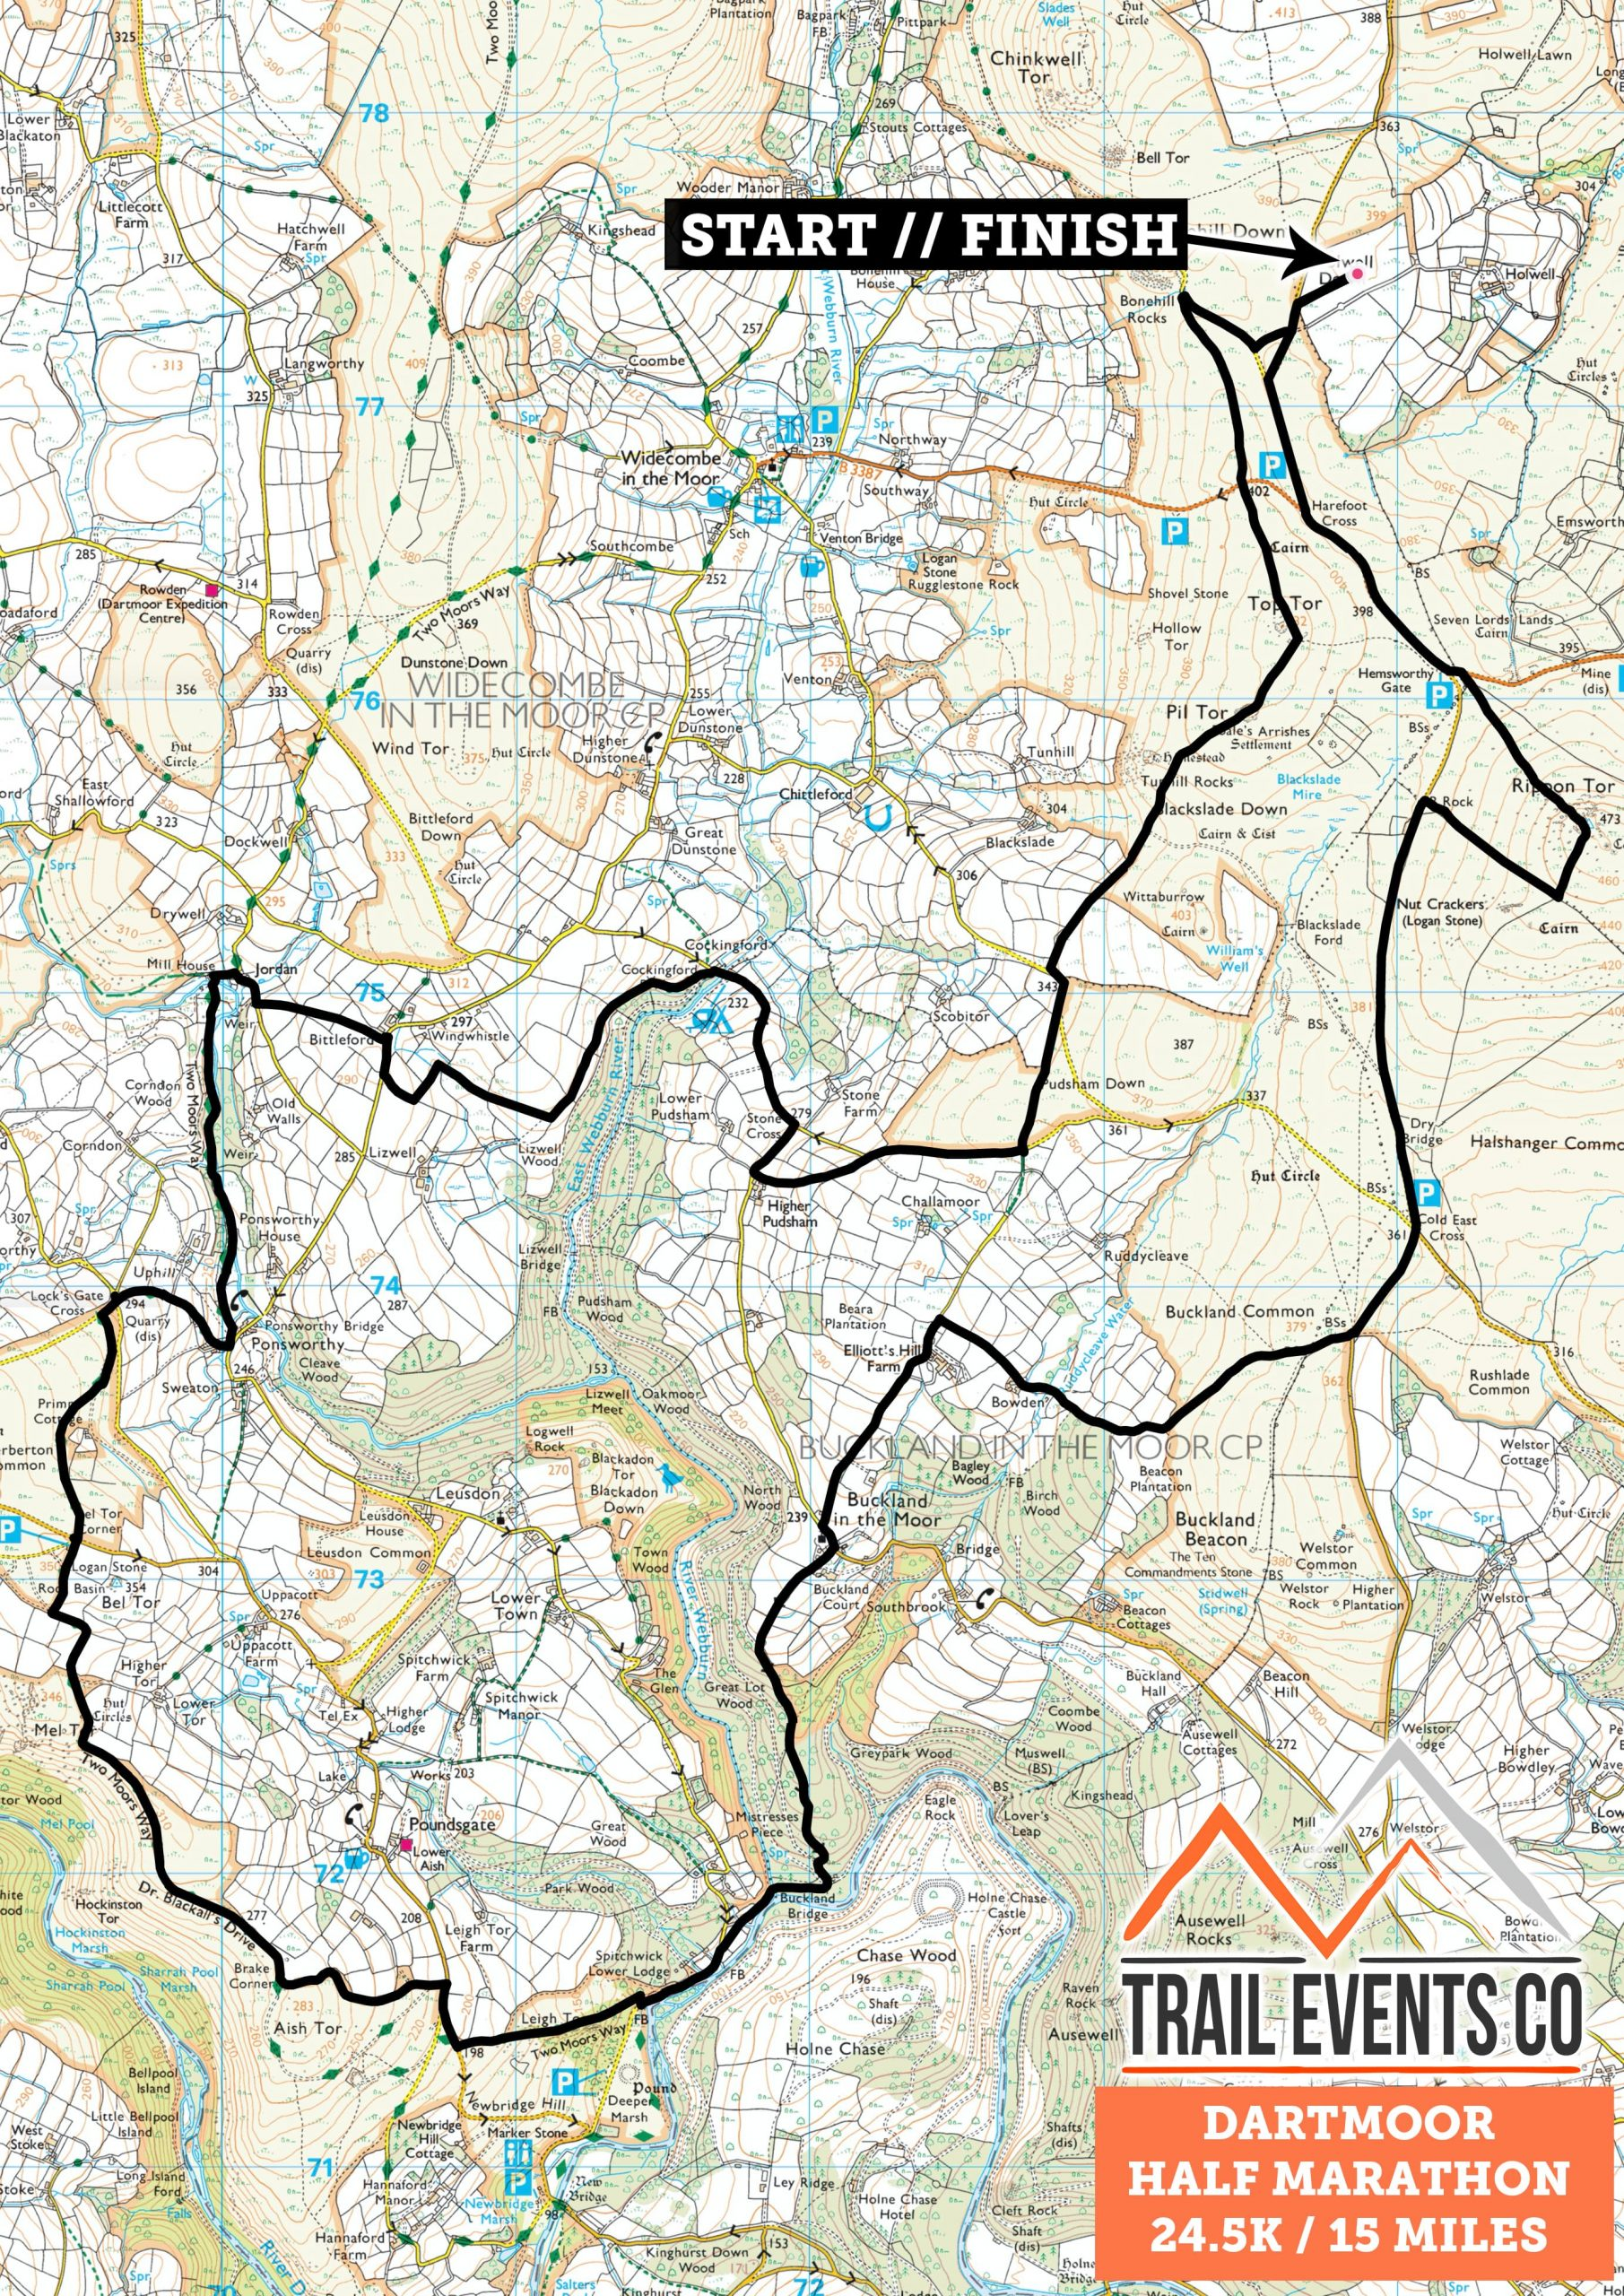 Dartmoor Half Marathon